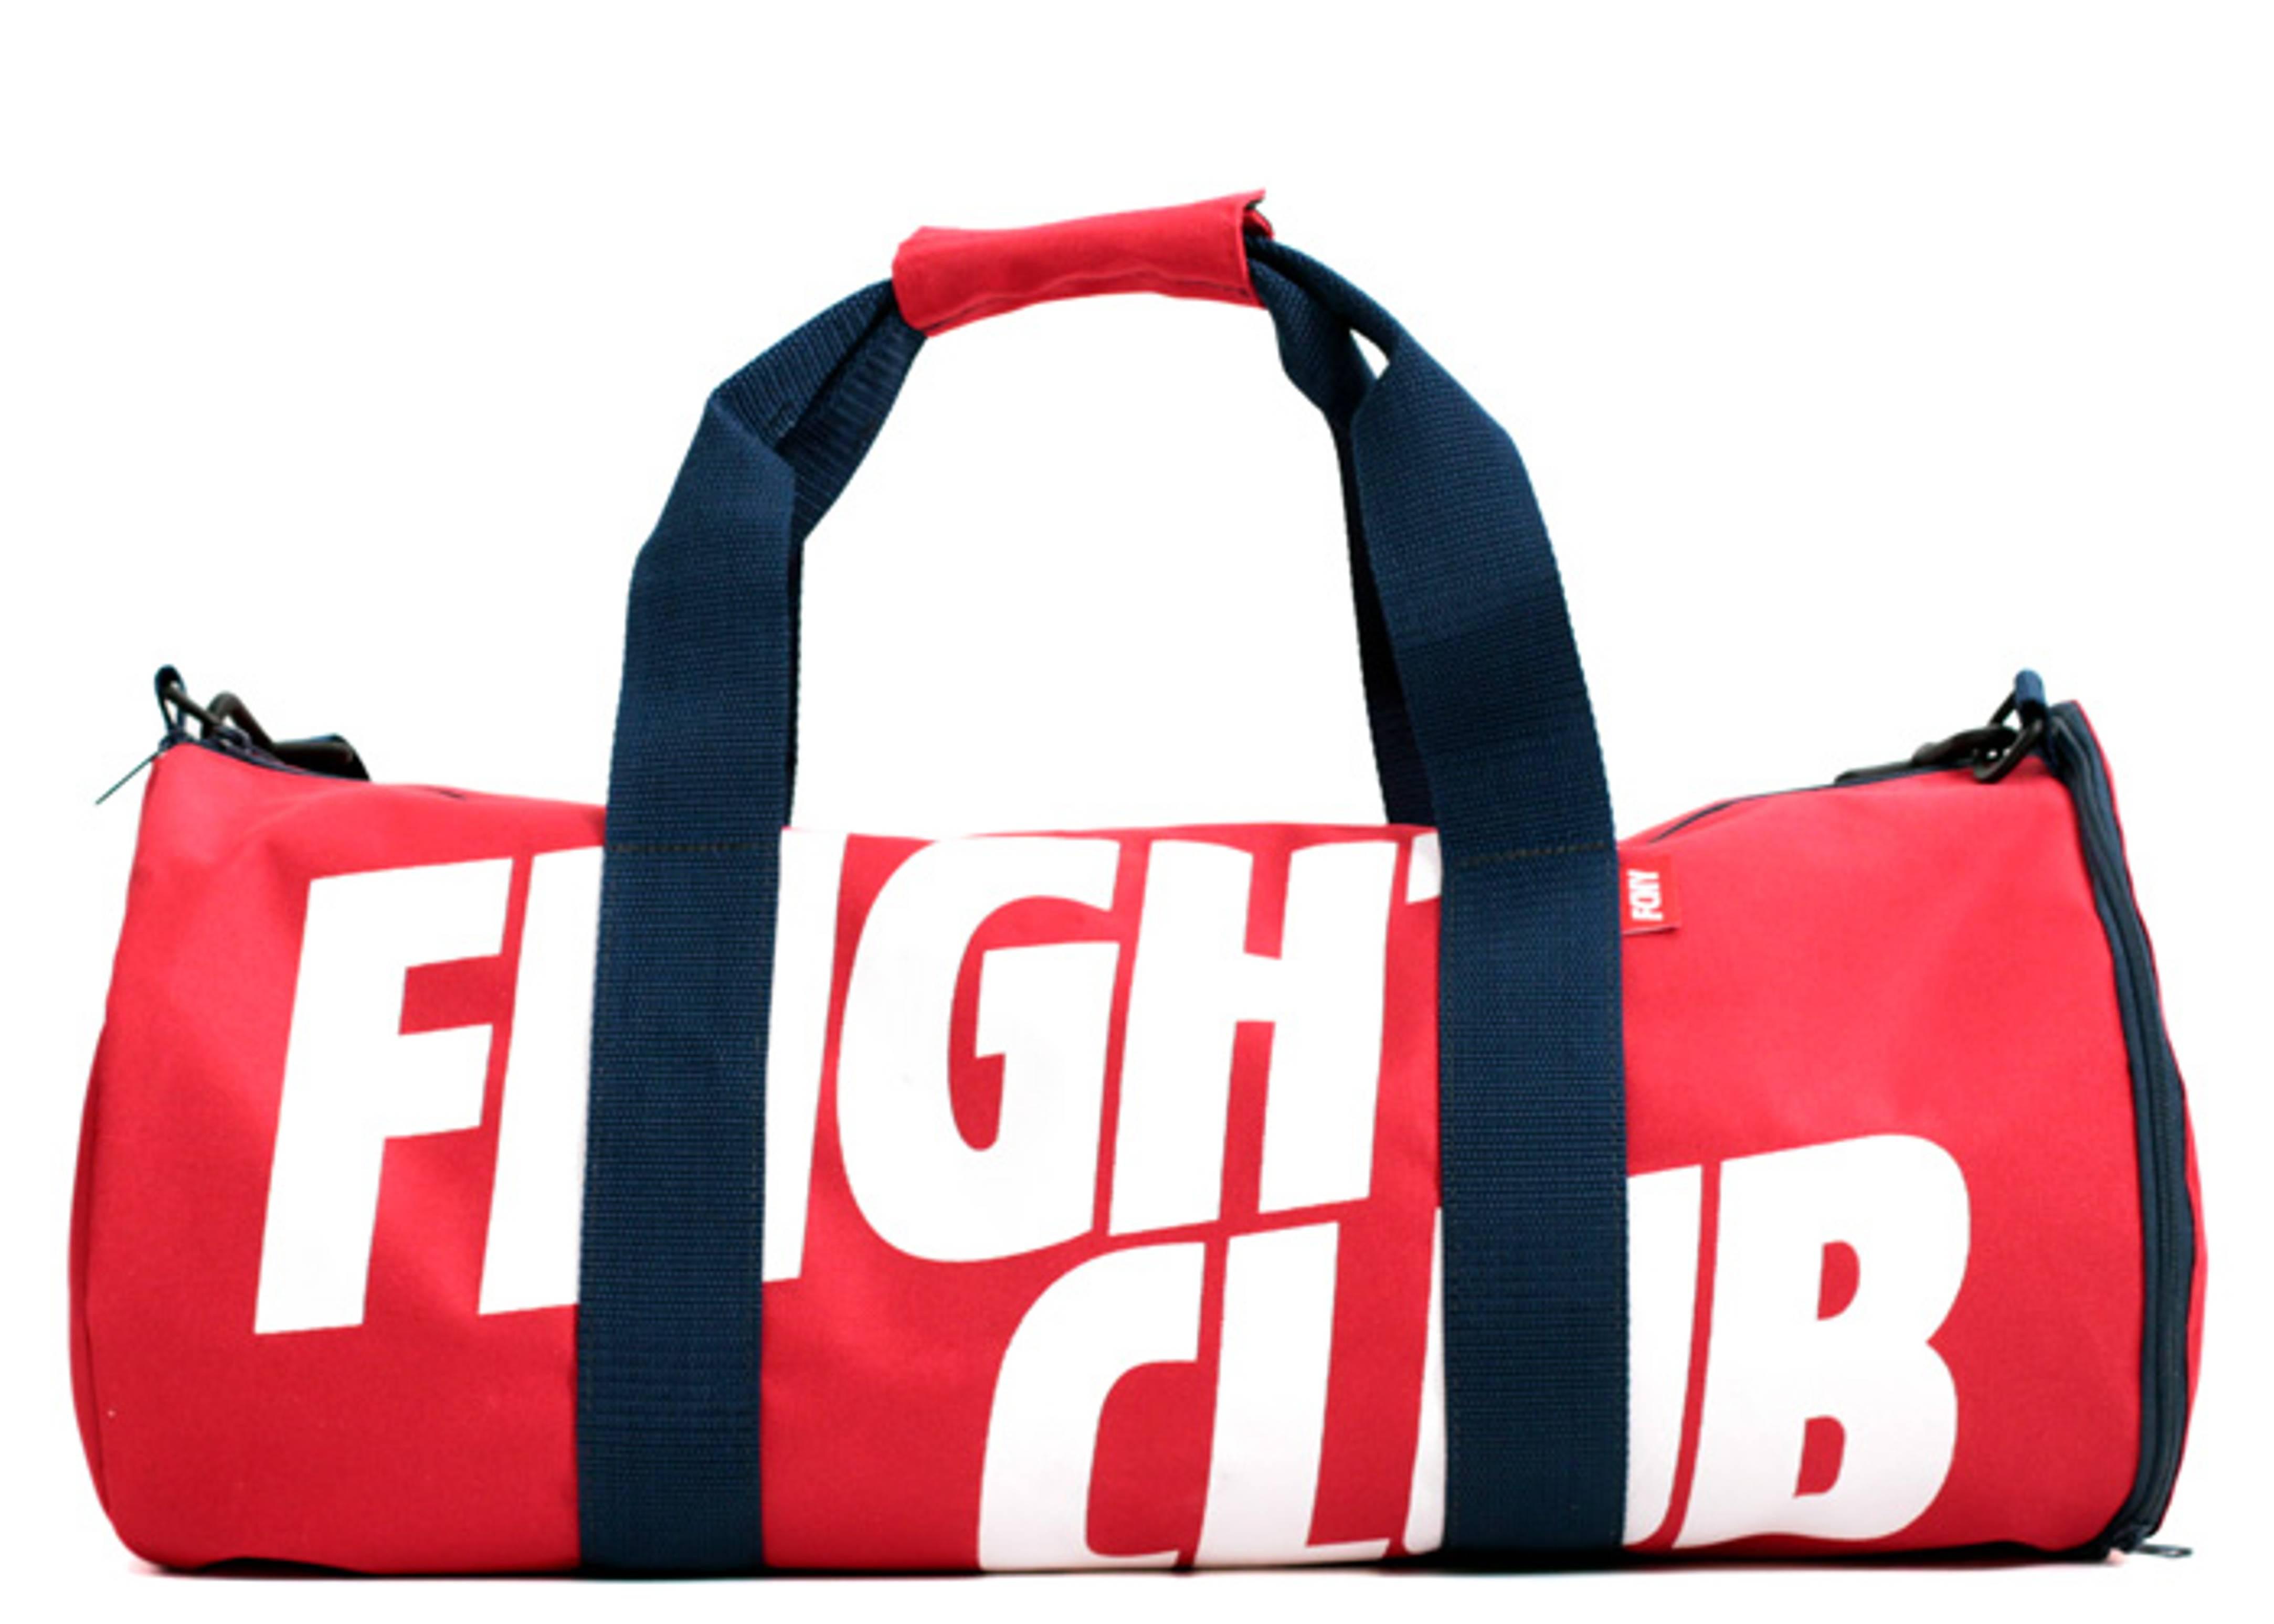 flight club duffel